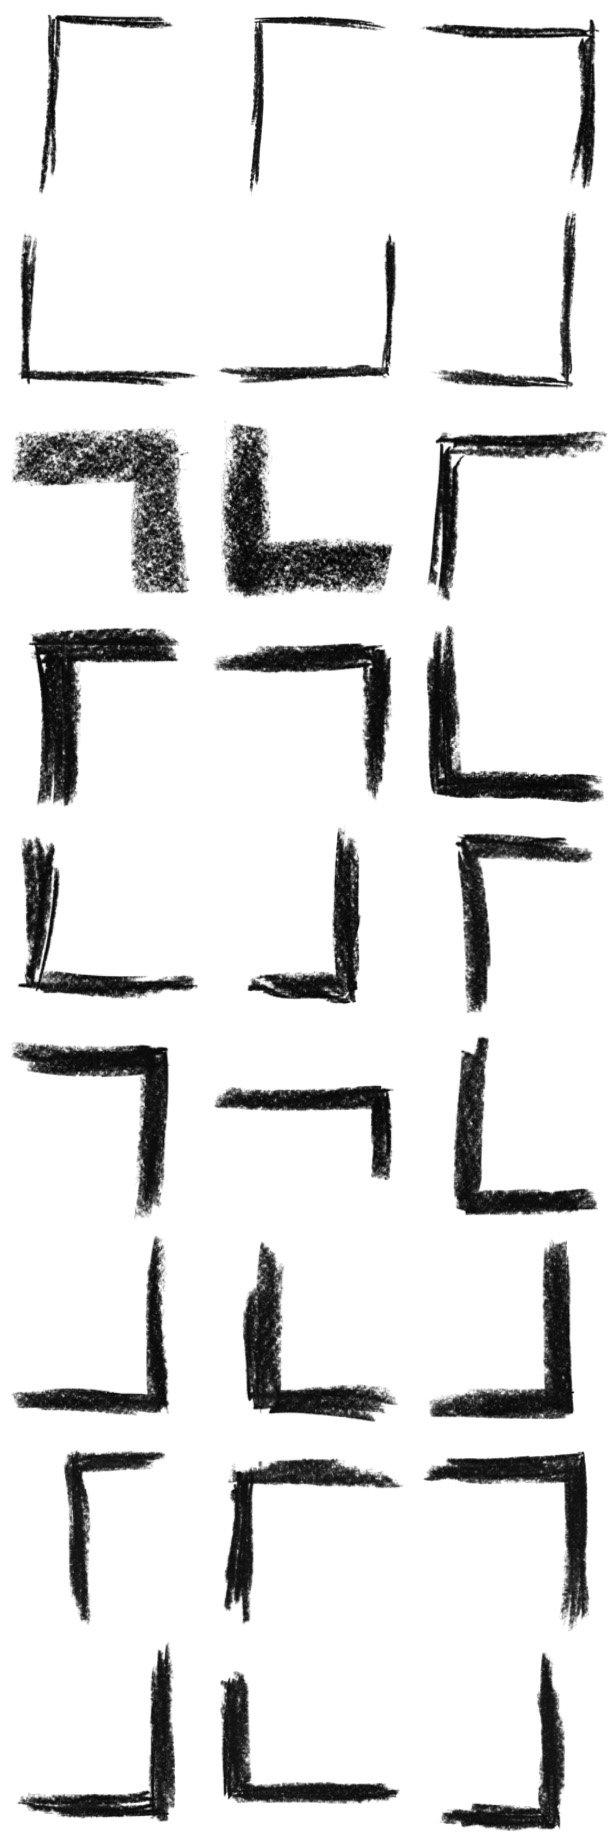 Hand-Drawn Corners